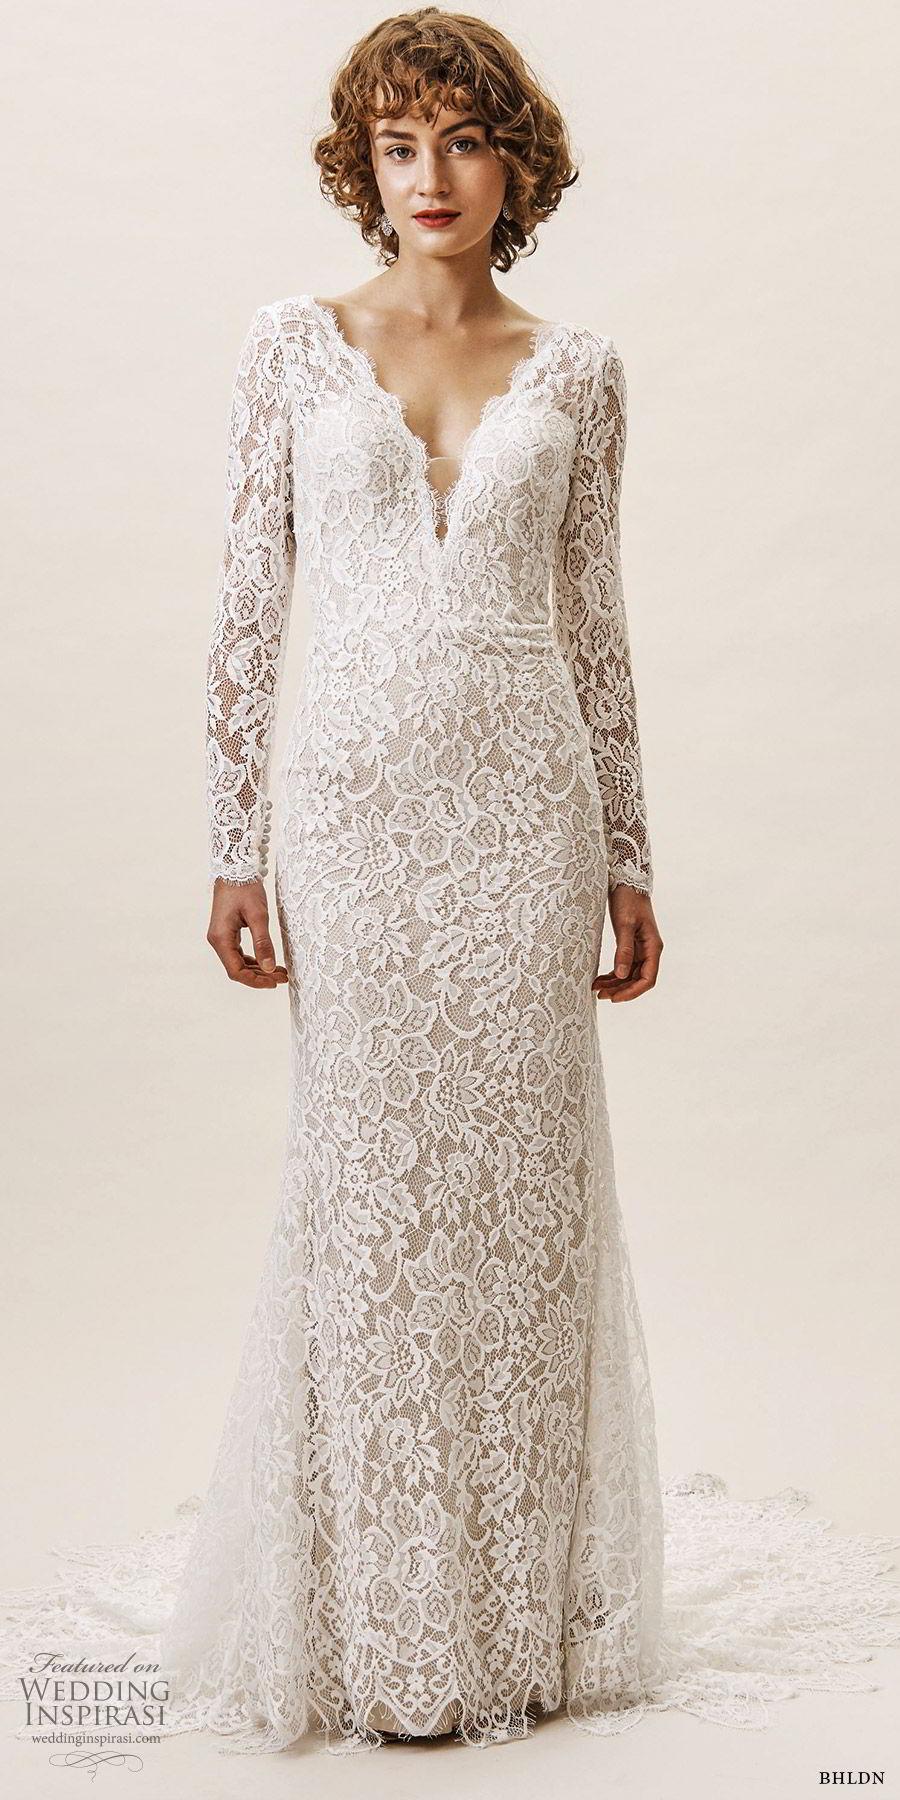 bhldn spring 2019 bridal illusion long sleeves v neckline sheath lace wedding dress low back chapel train (14) mv